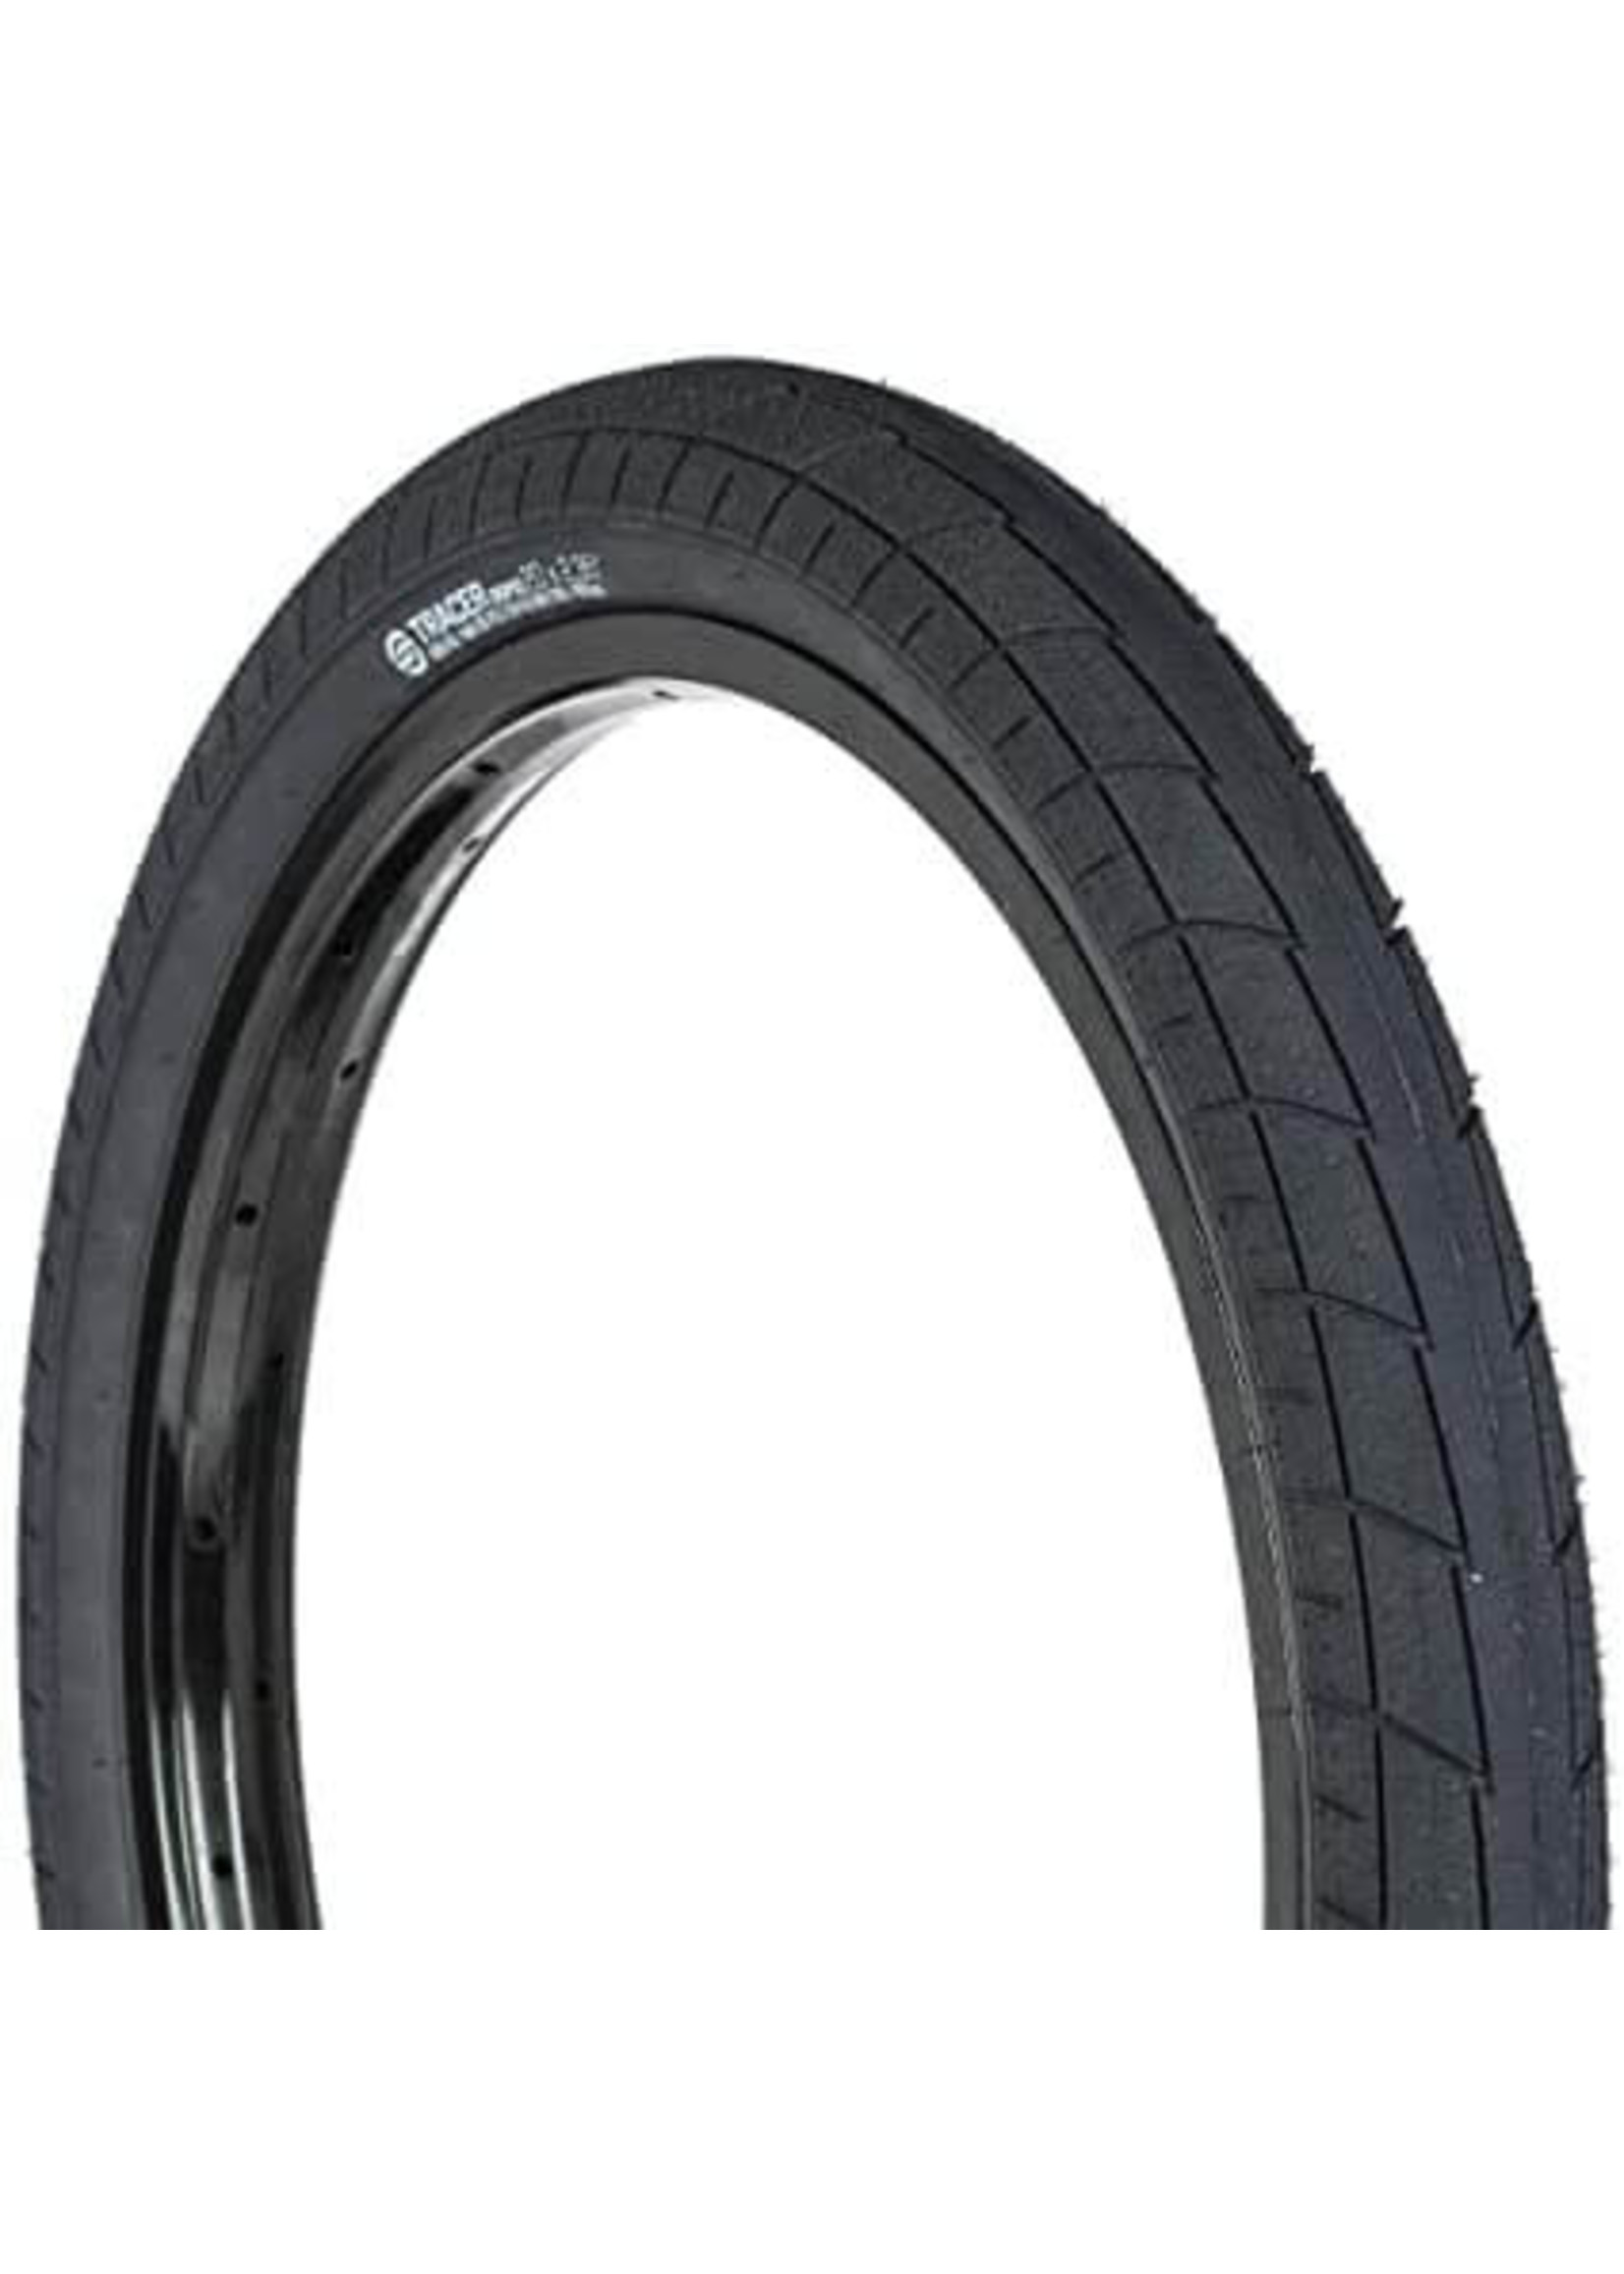 Salt Salt - Tracer Tire - 16 x 2.20